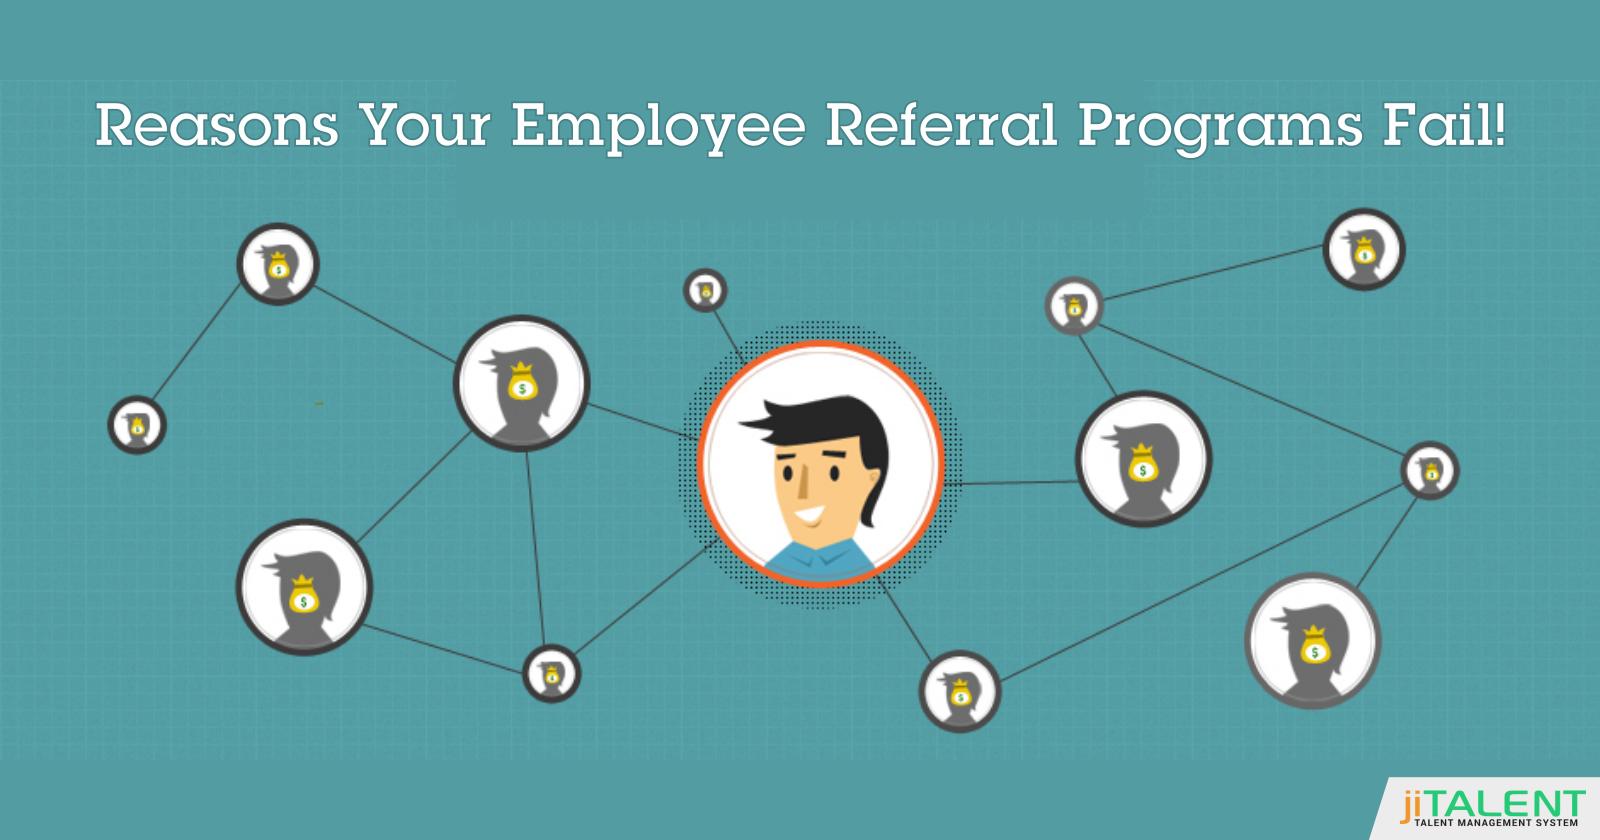 Why Employee Referral Programs Fail